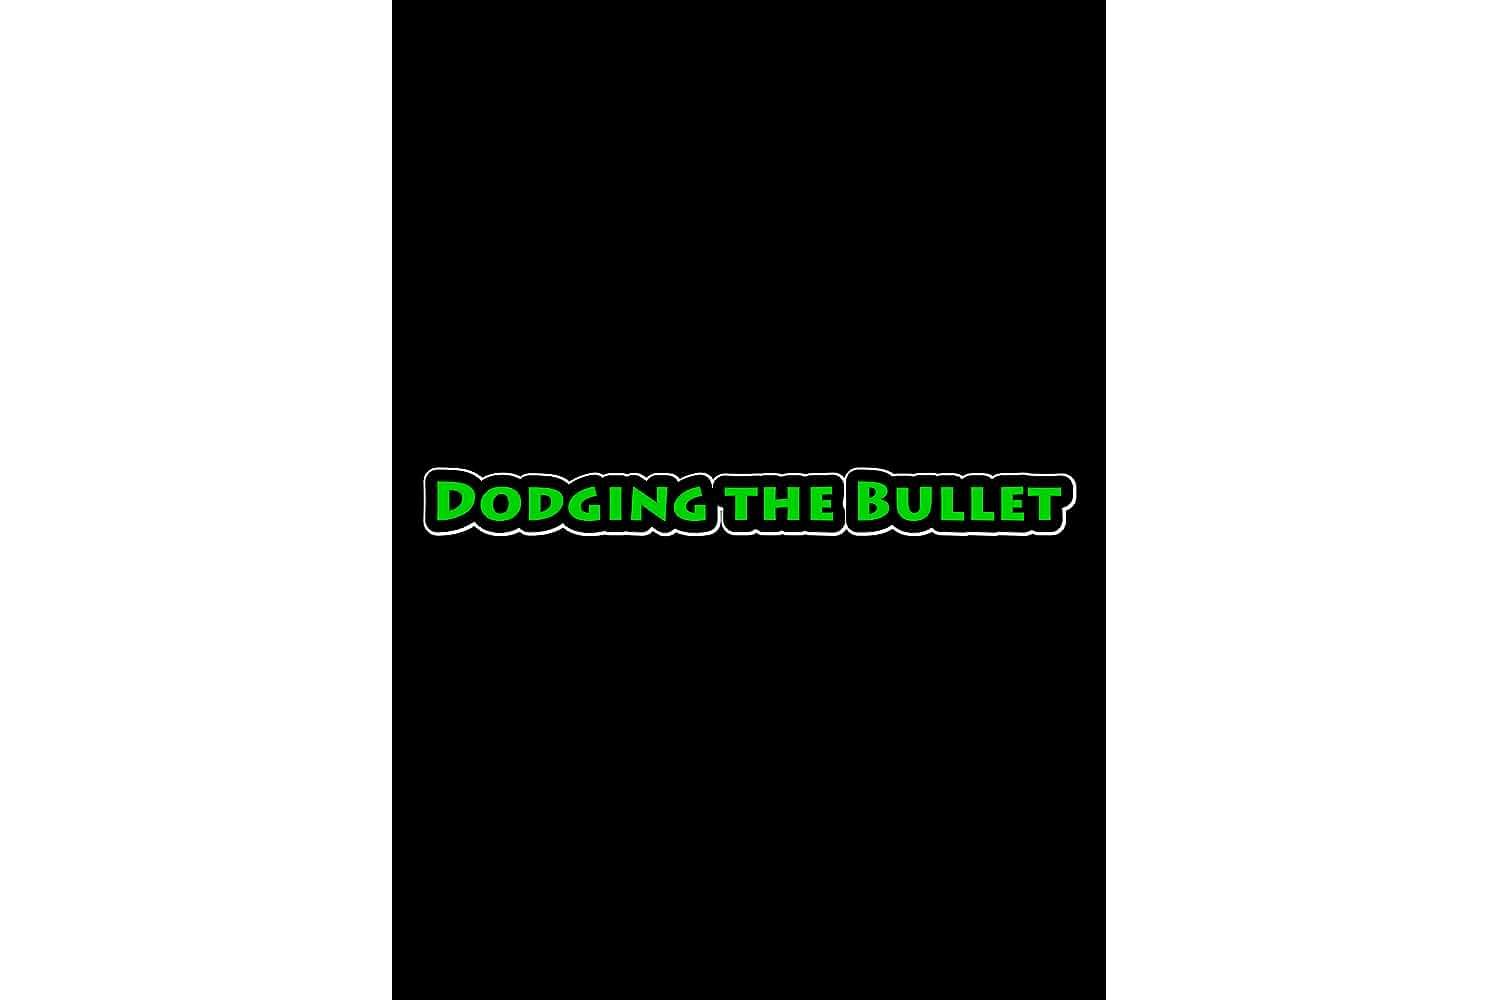 Dodging the Bullet (2018)